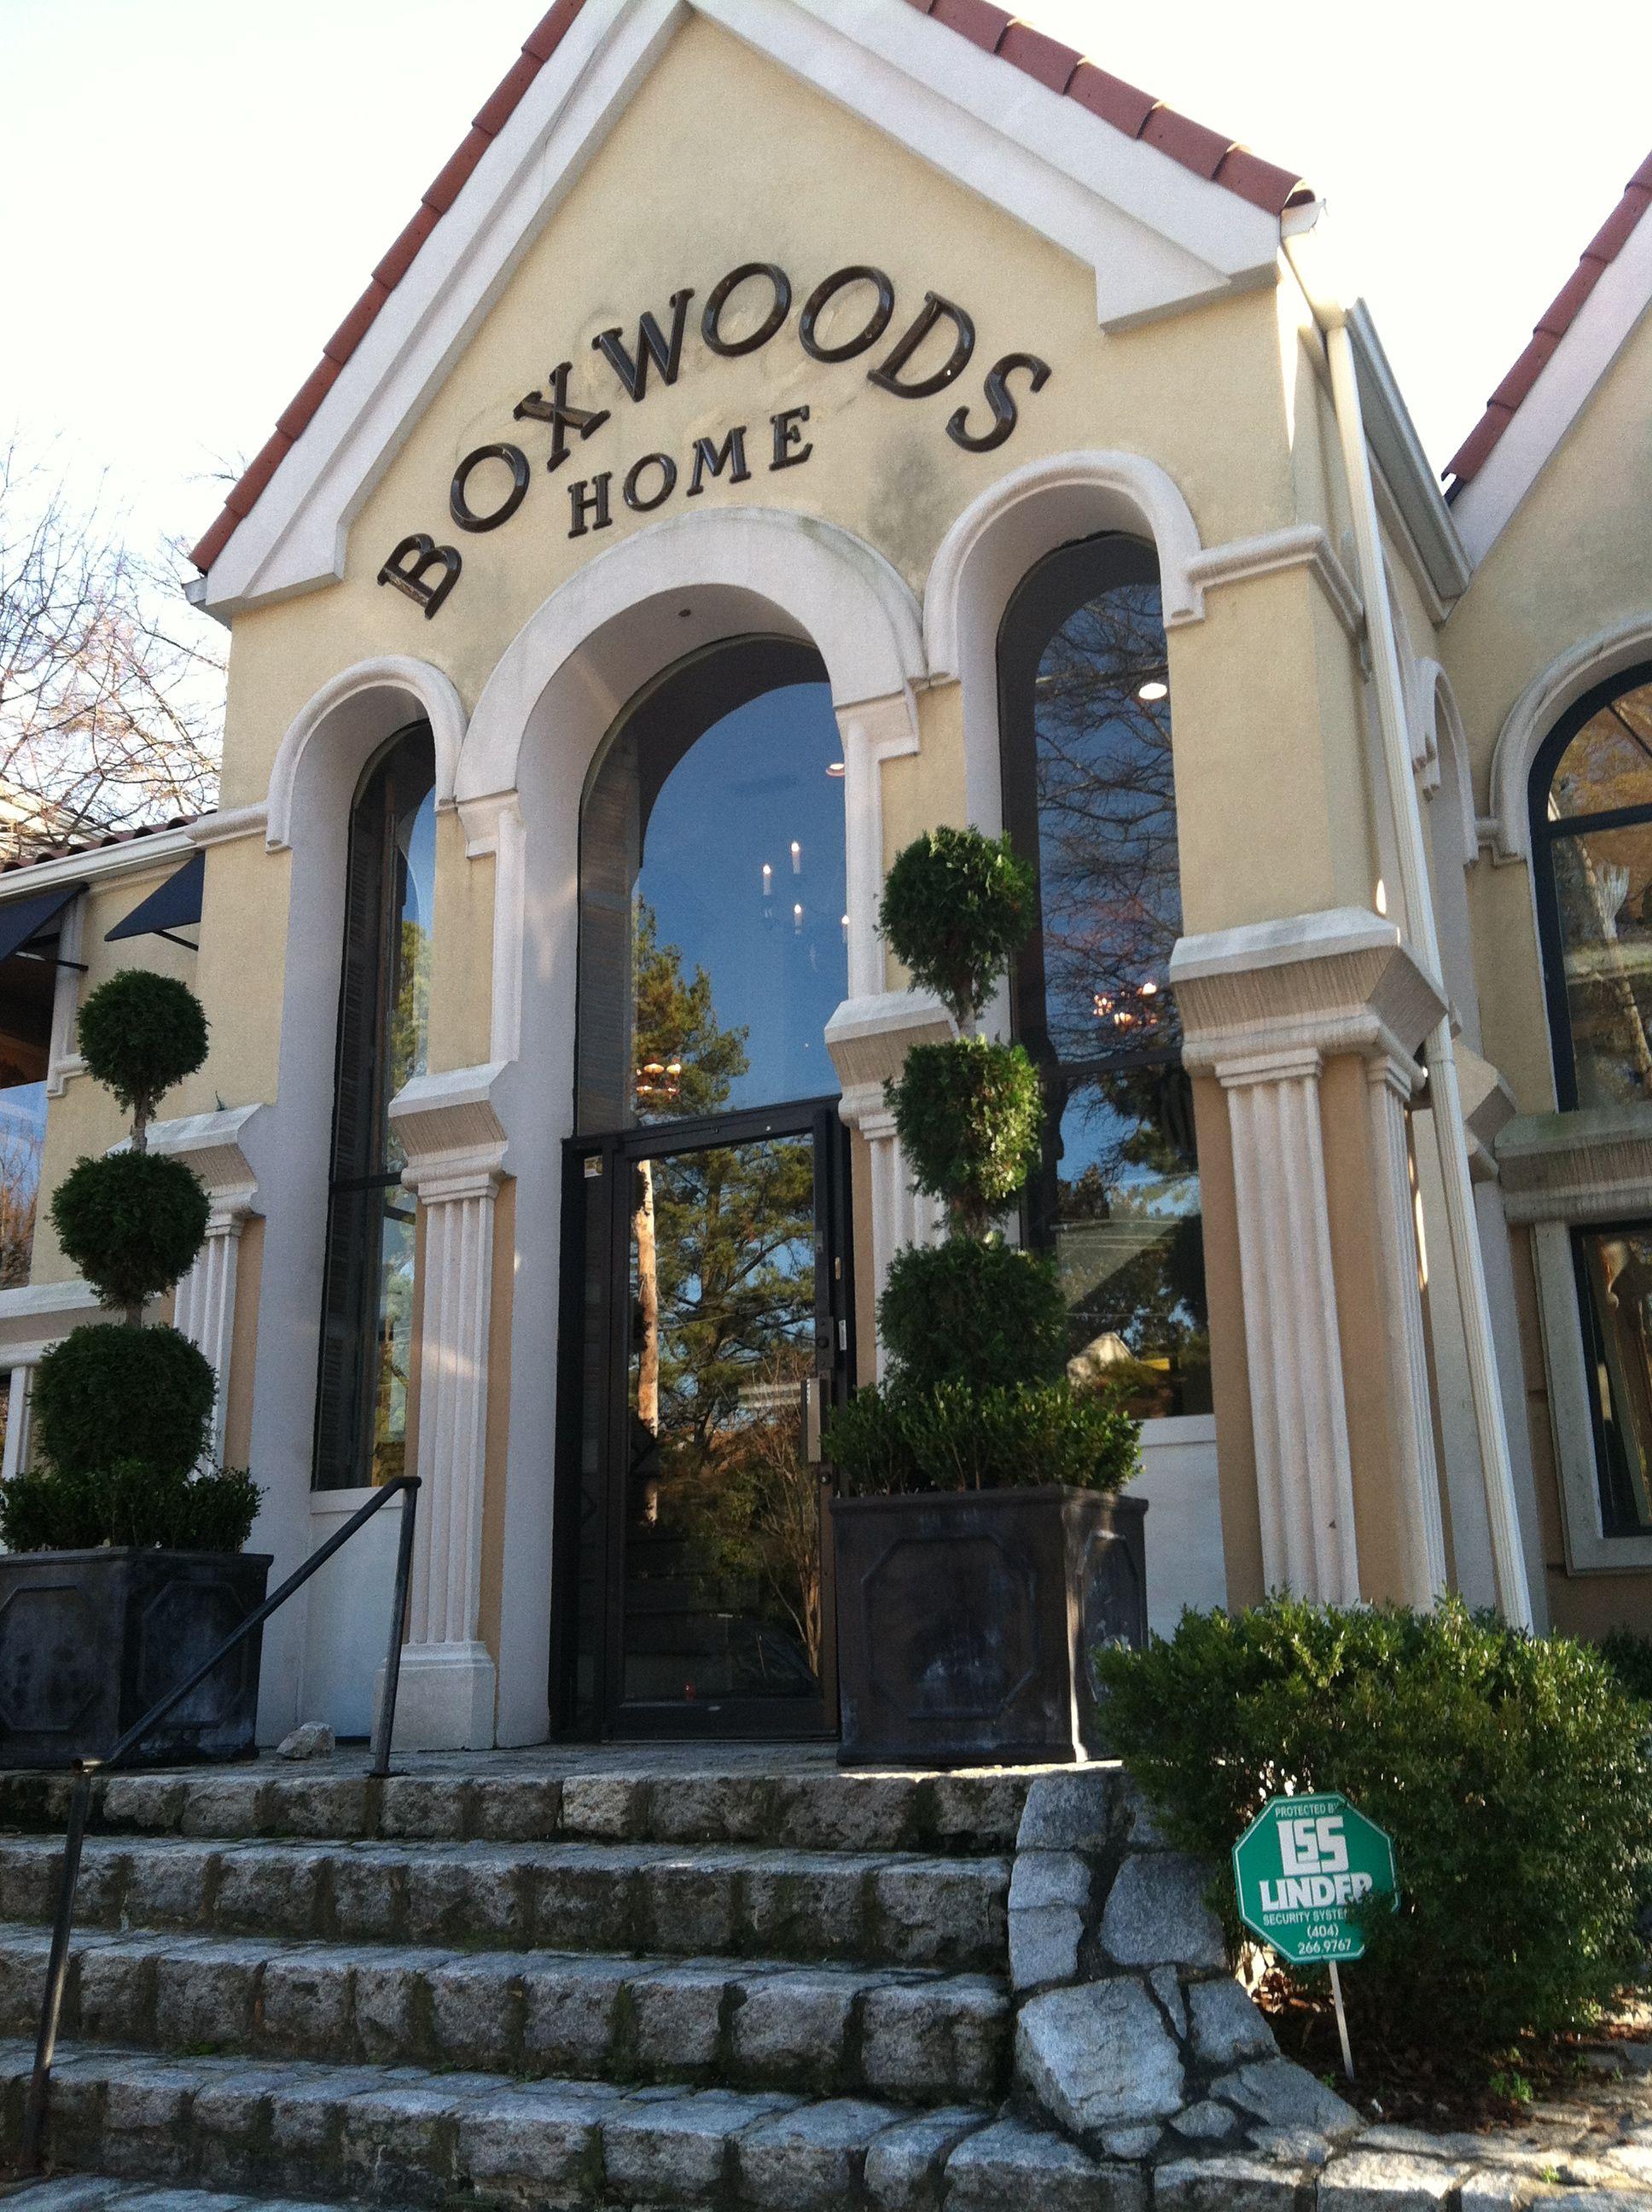 Boxwoods Home, Atlanta, Ga